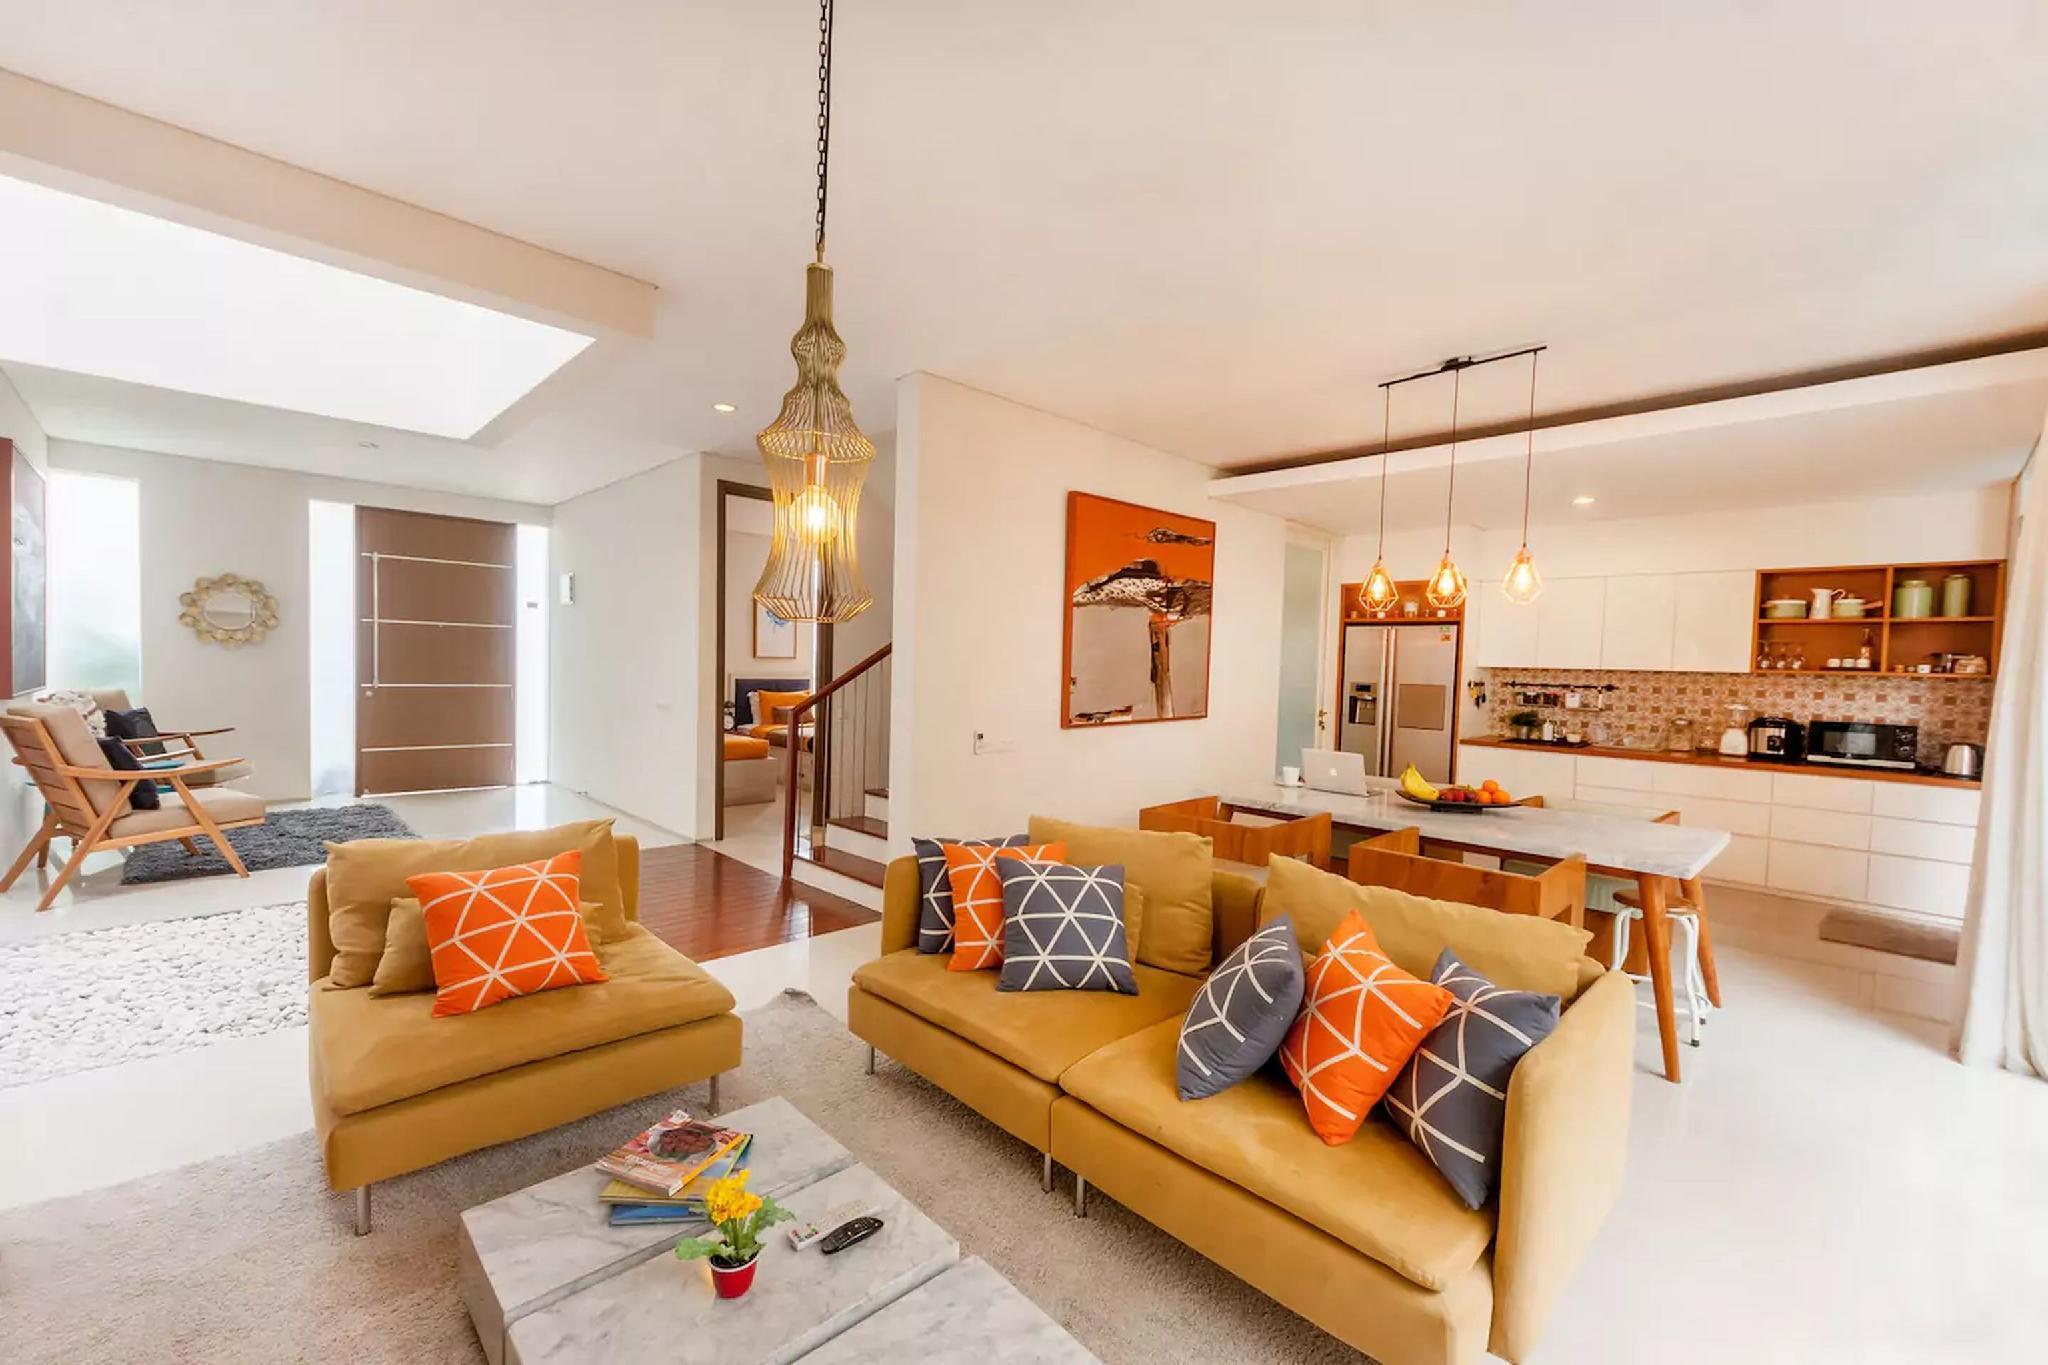 4 BR Contemporary House Abhinaya Citraland